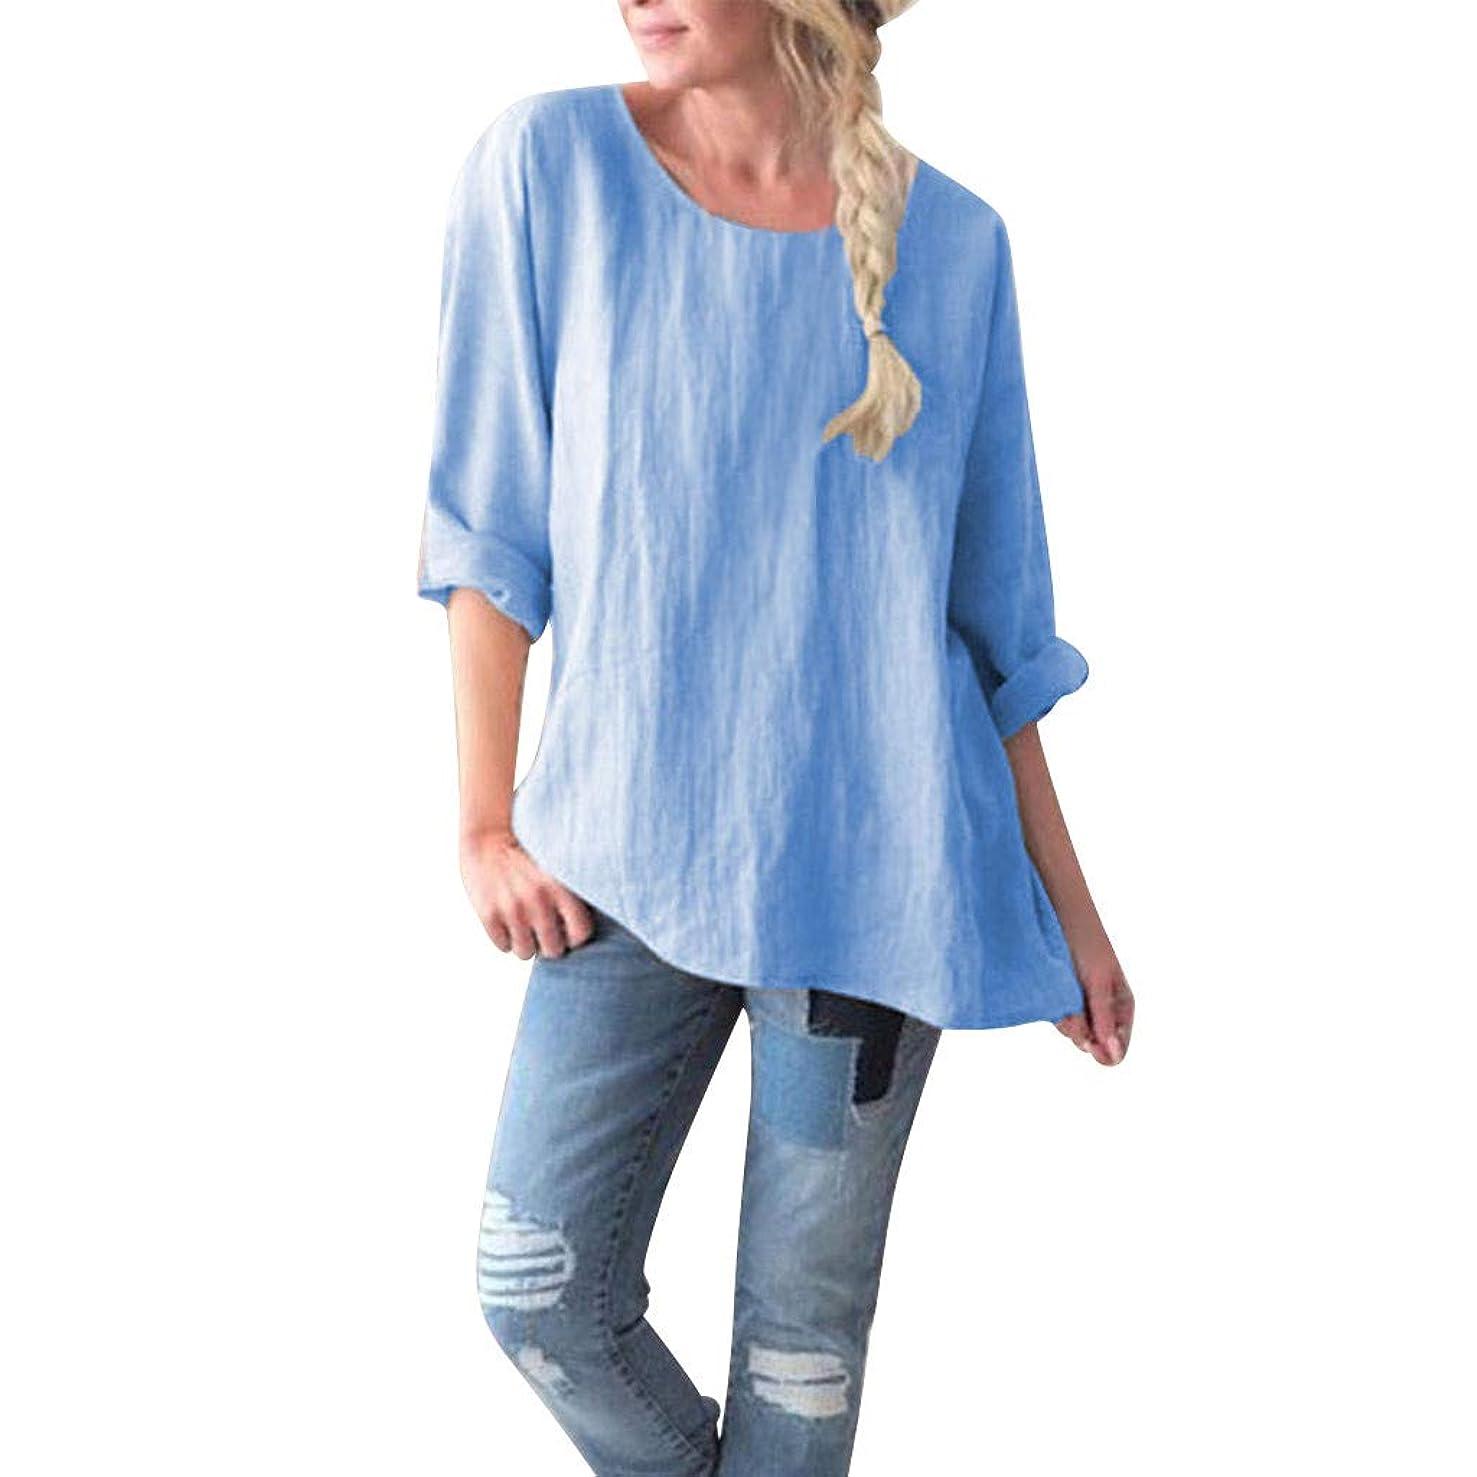 DONTAL Women's Round Collar Plain Colour Loose Size Cotton and Hemp Jacket Blouse Tops